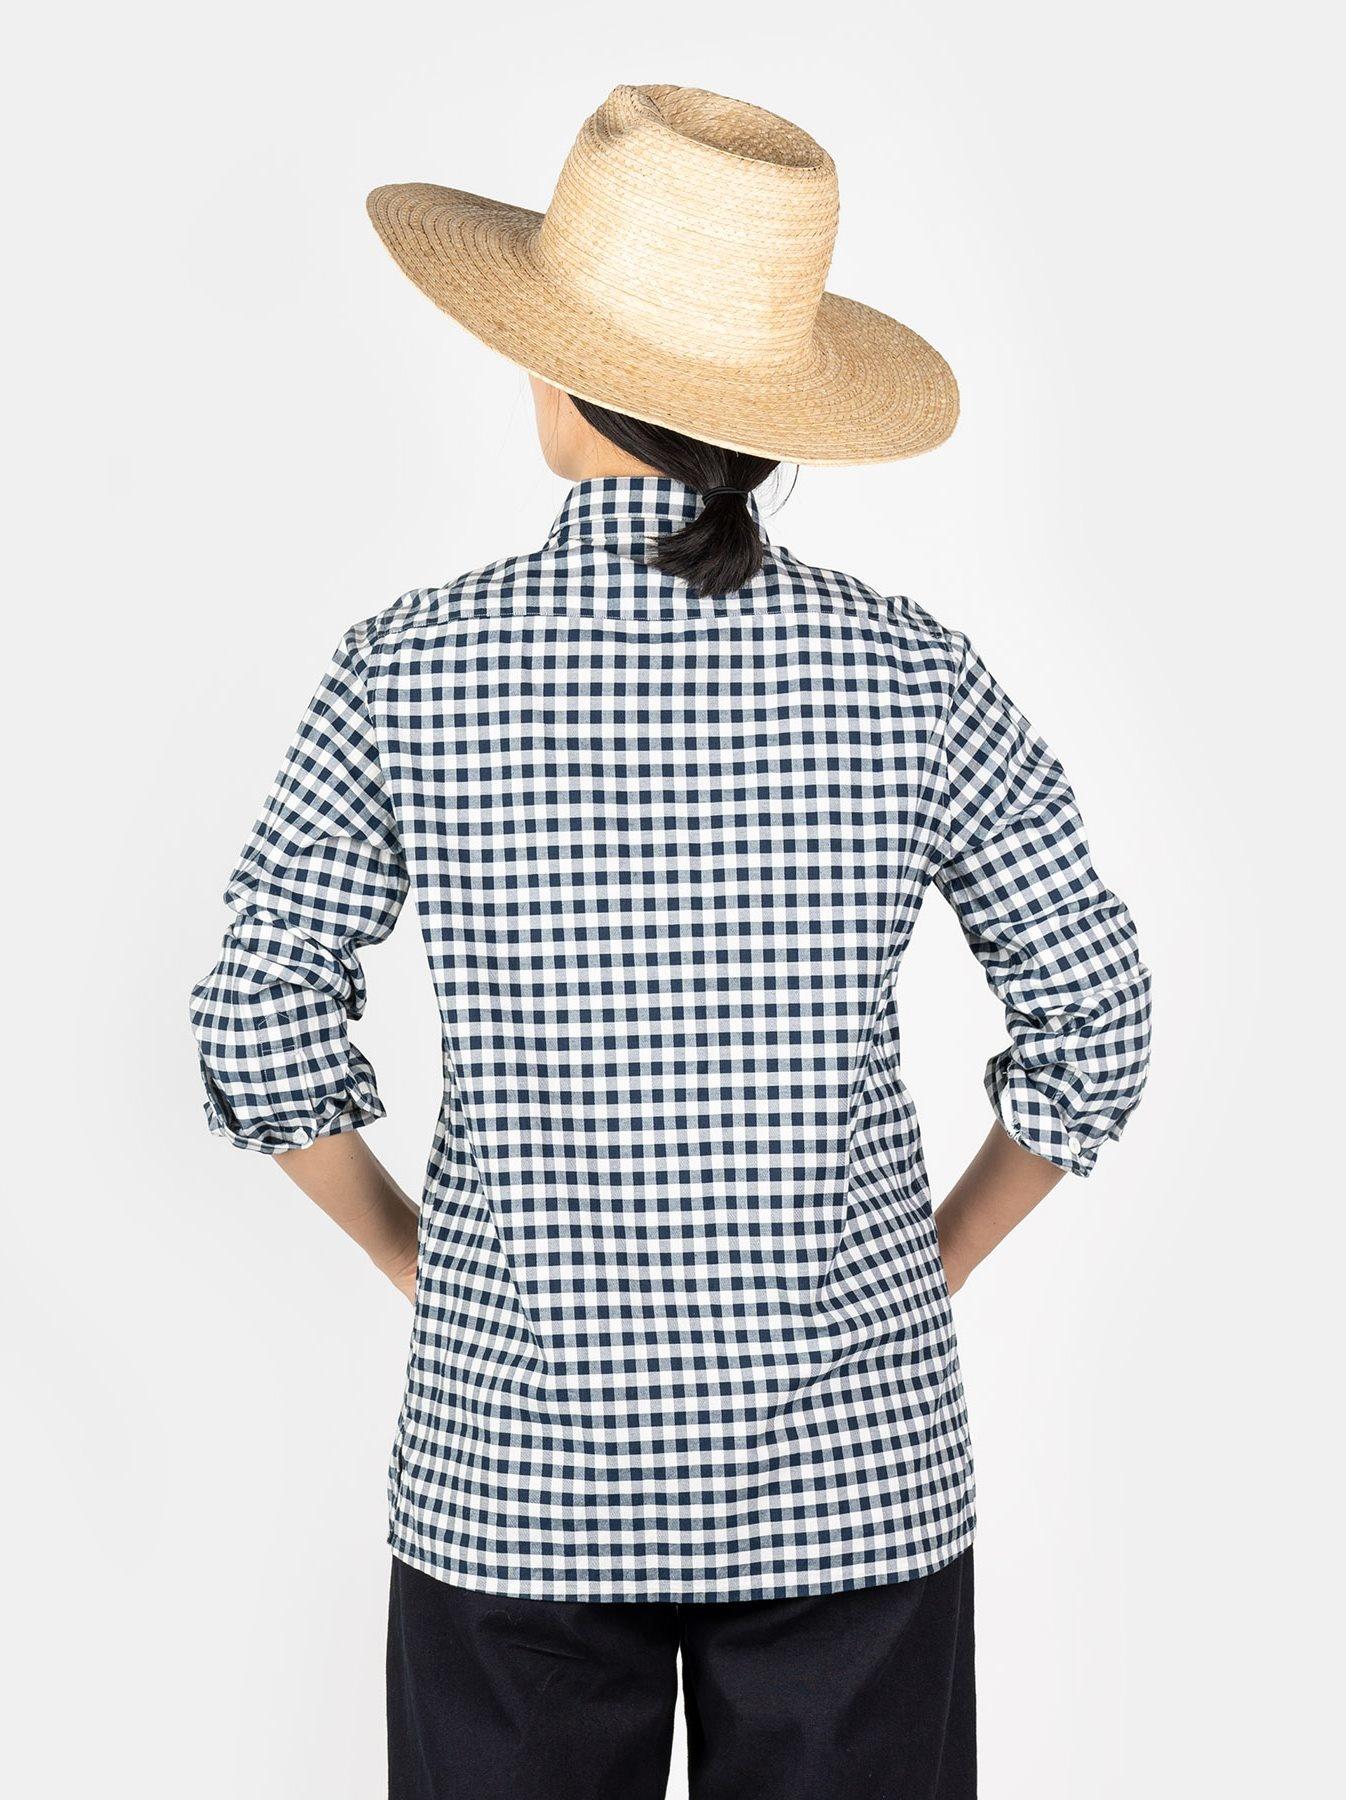 WH Indigo Oxford 908 Round Collar Shirt-7